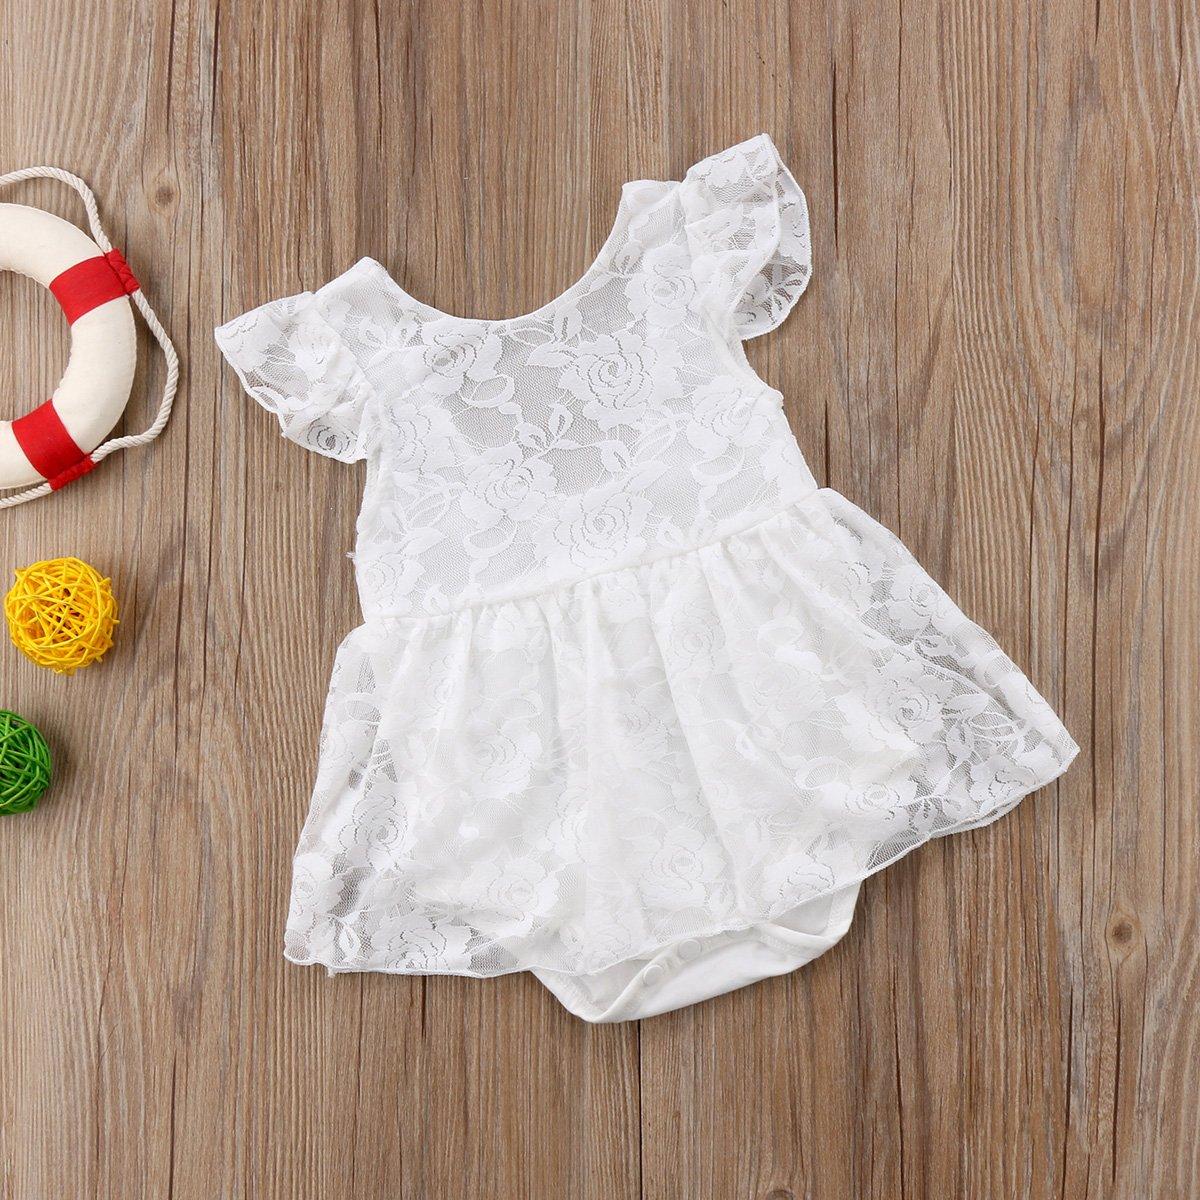 Imcute Newborn Baby Girls White Lace Princess Short Sleeve Romper Dresses for Summer